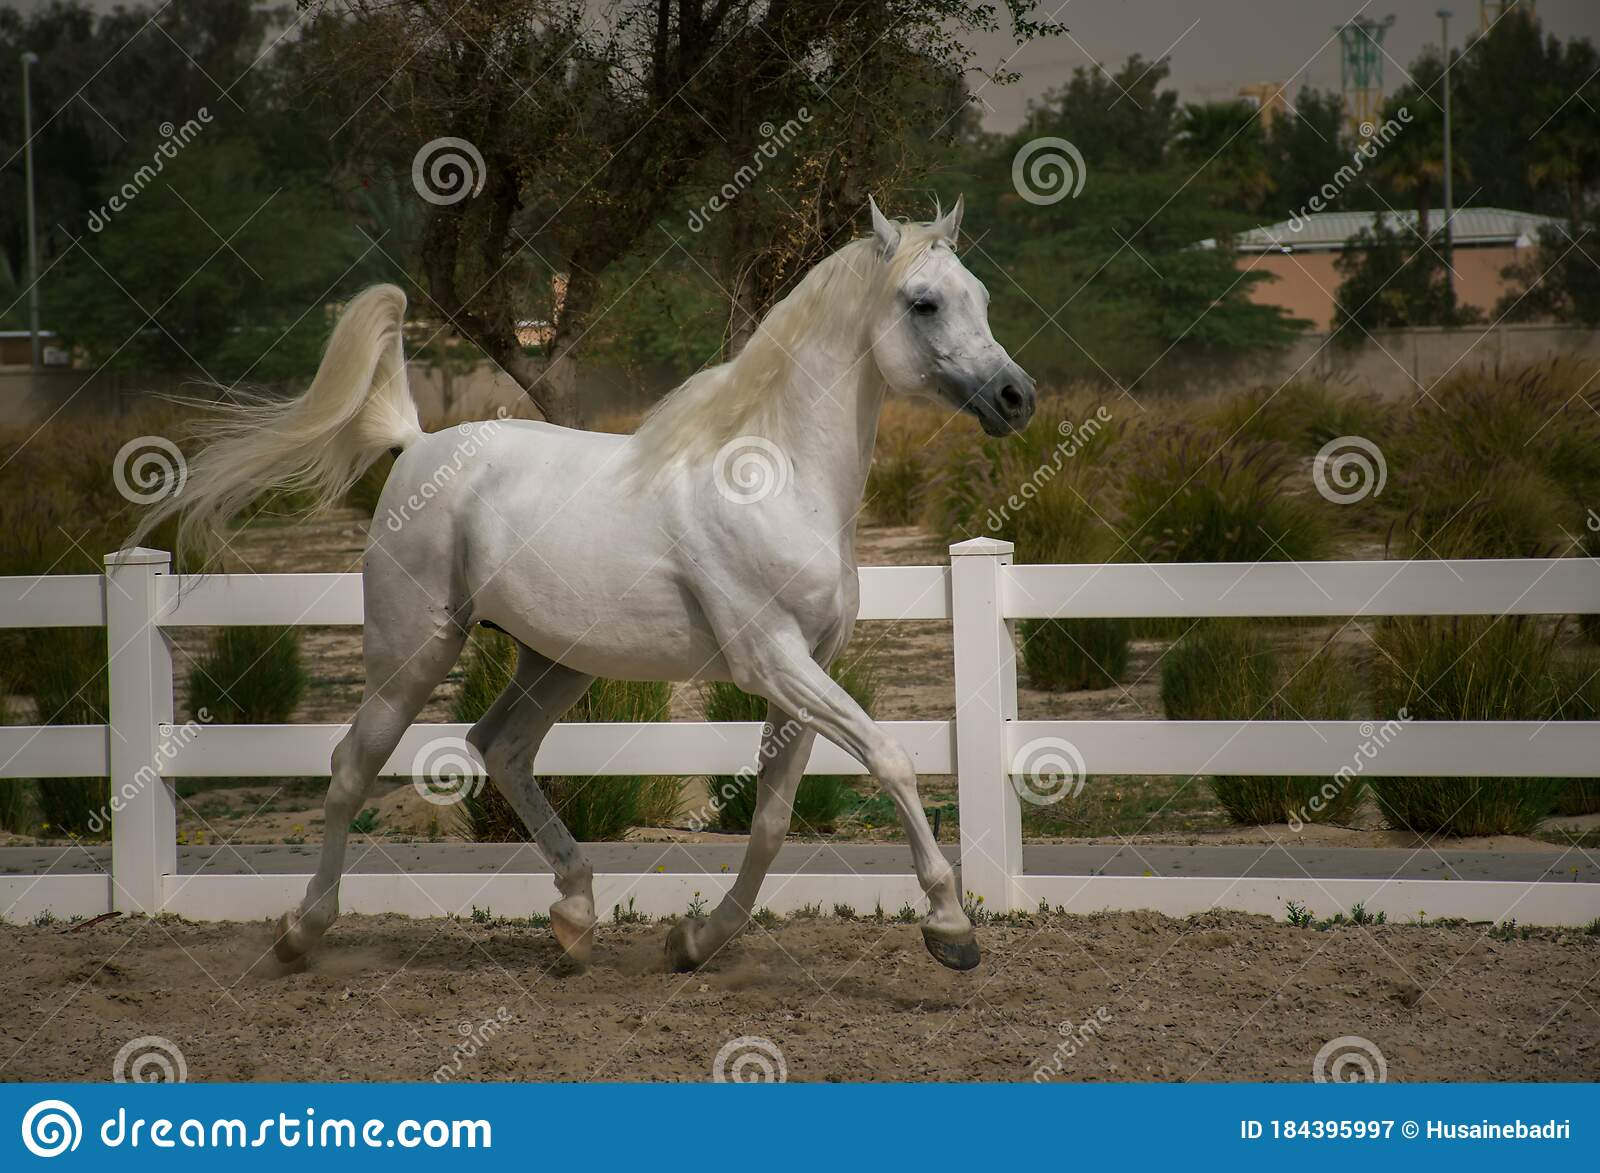 Arabian White Stallion Running In Horse Training Stock Image Image Of Allure Freedom 184395997